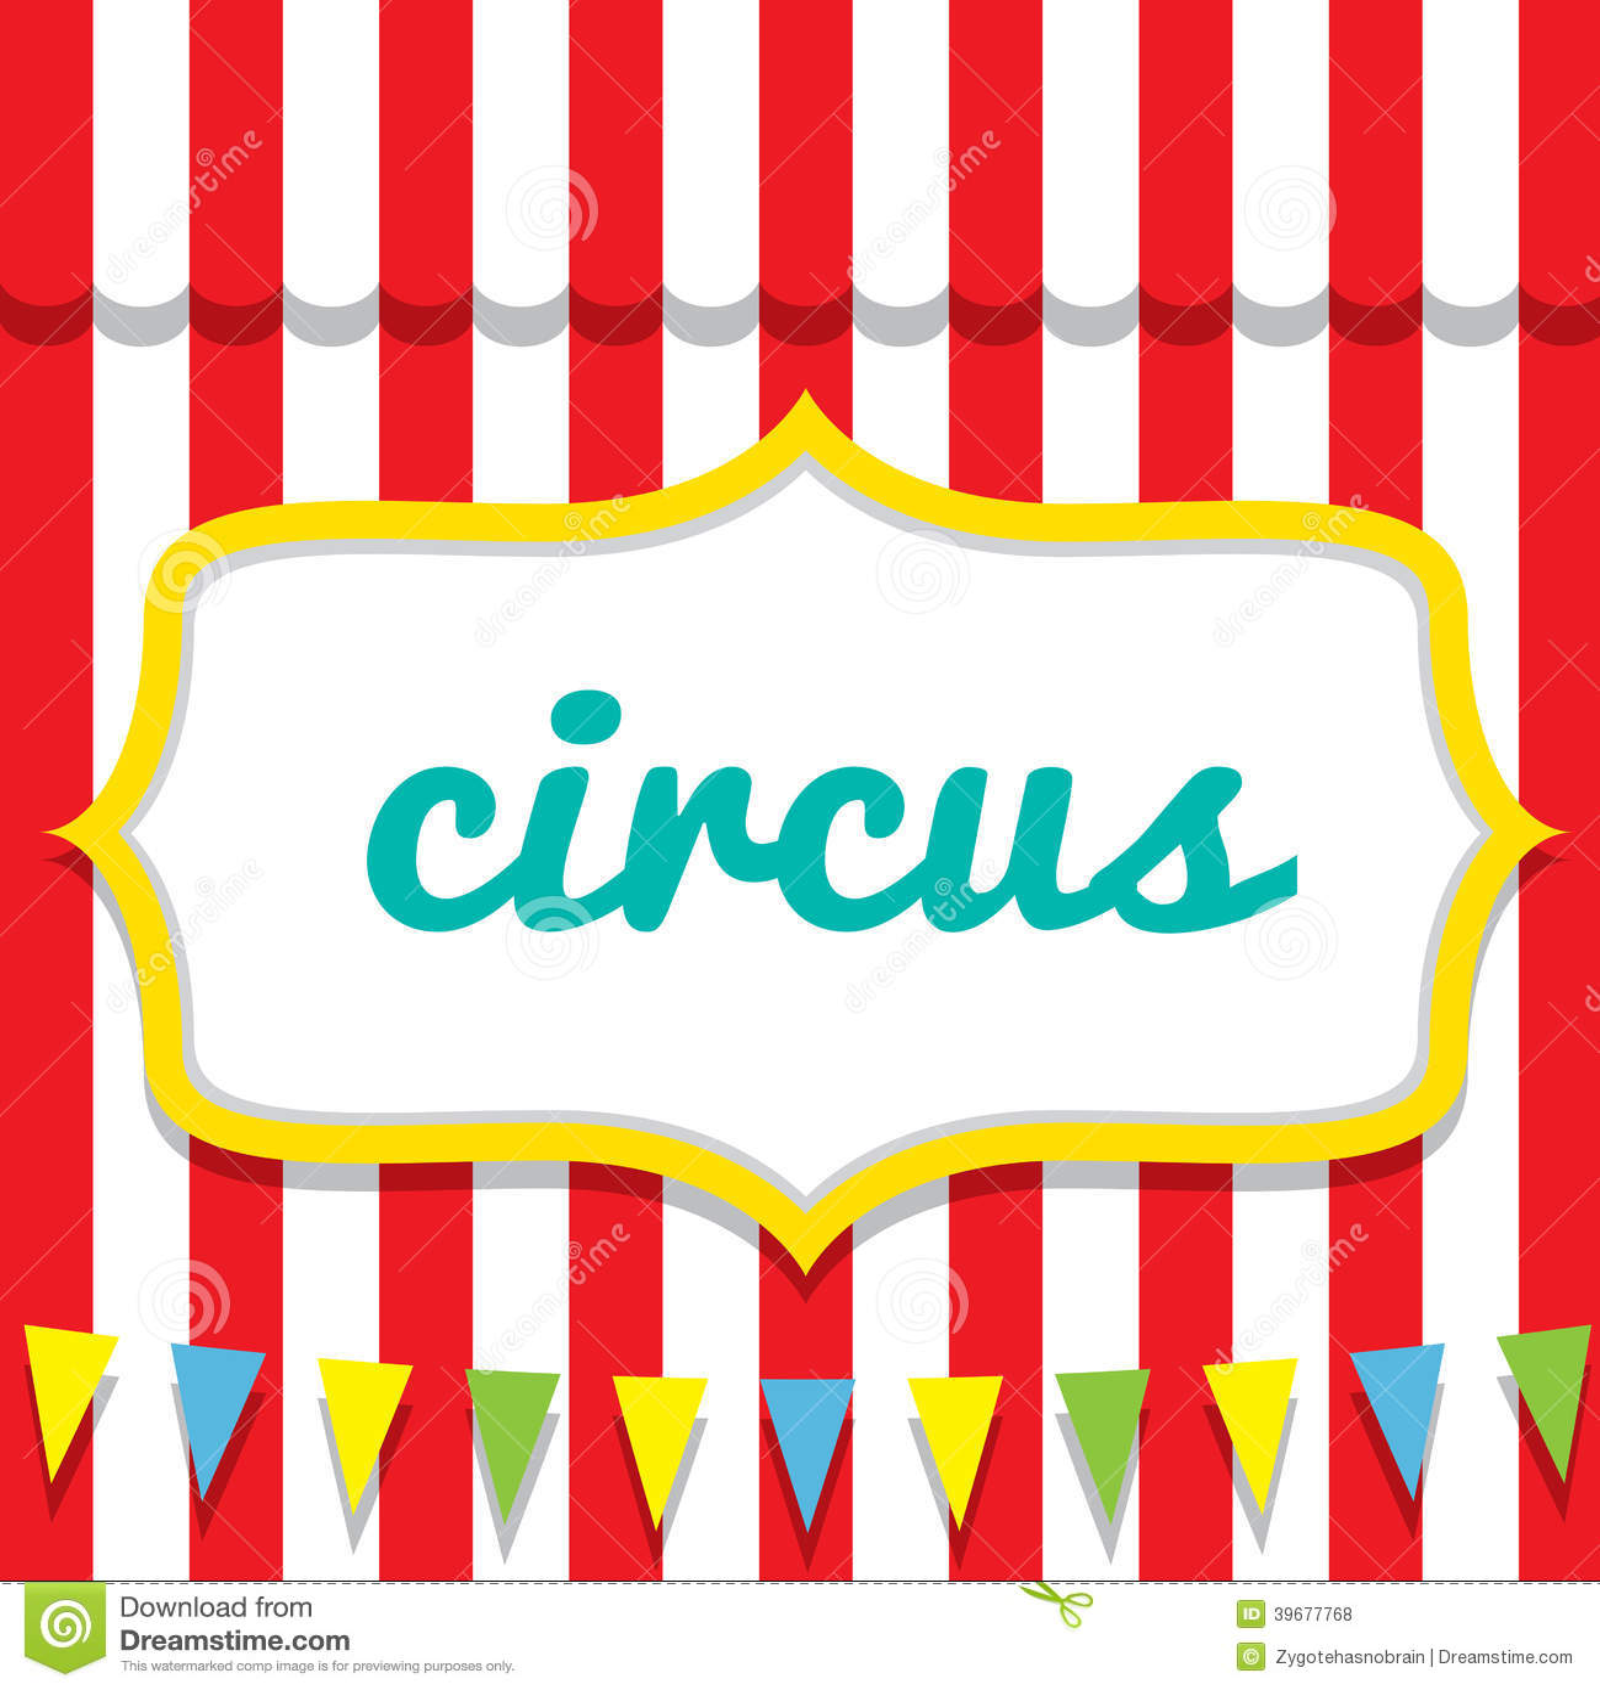 Circus Vector Illustration Stock Vector - Image: 39677768